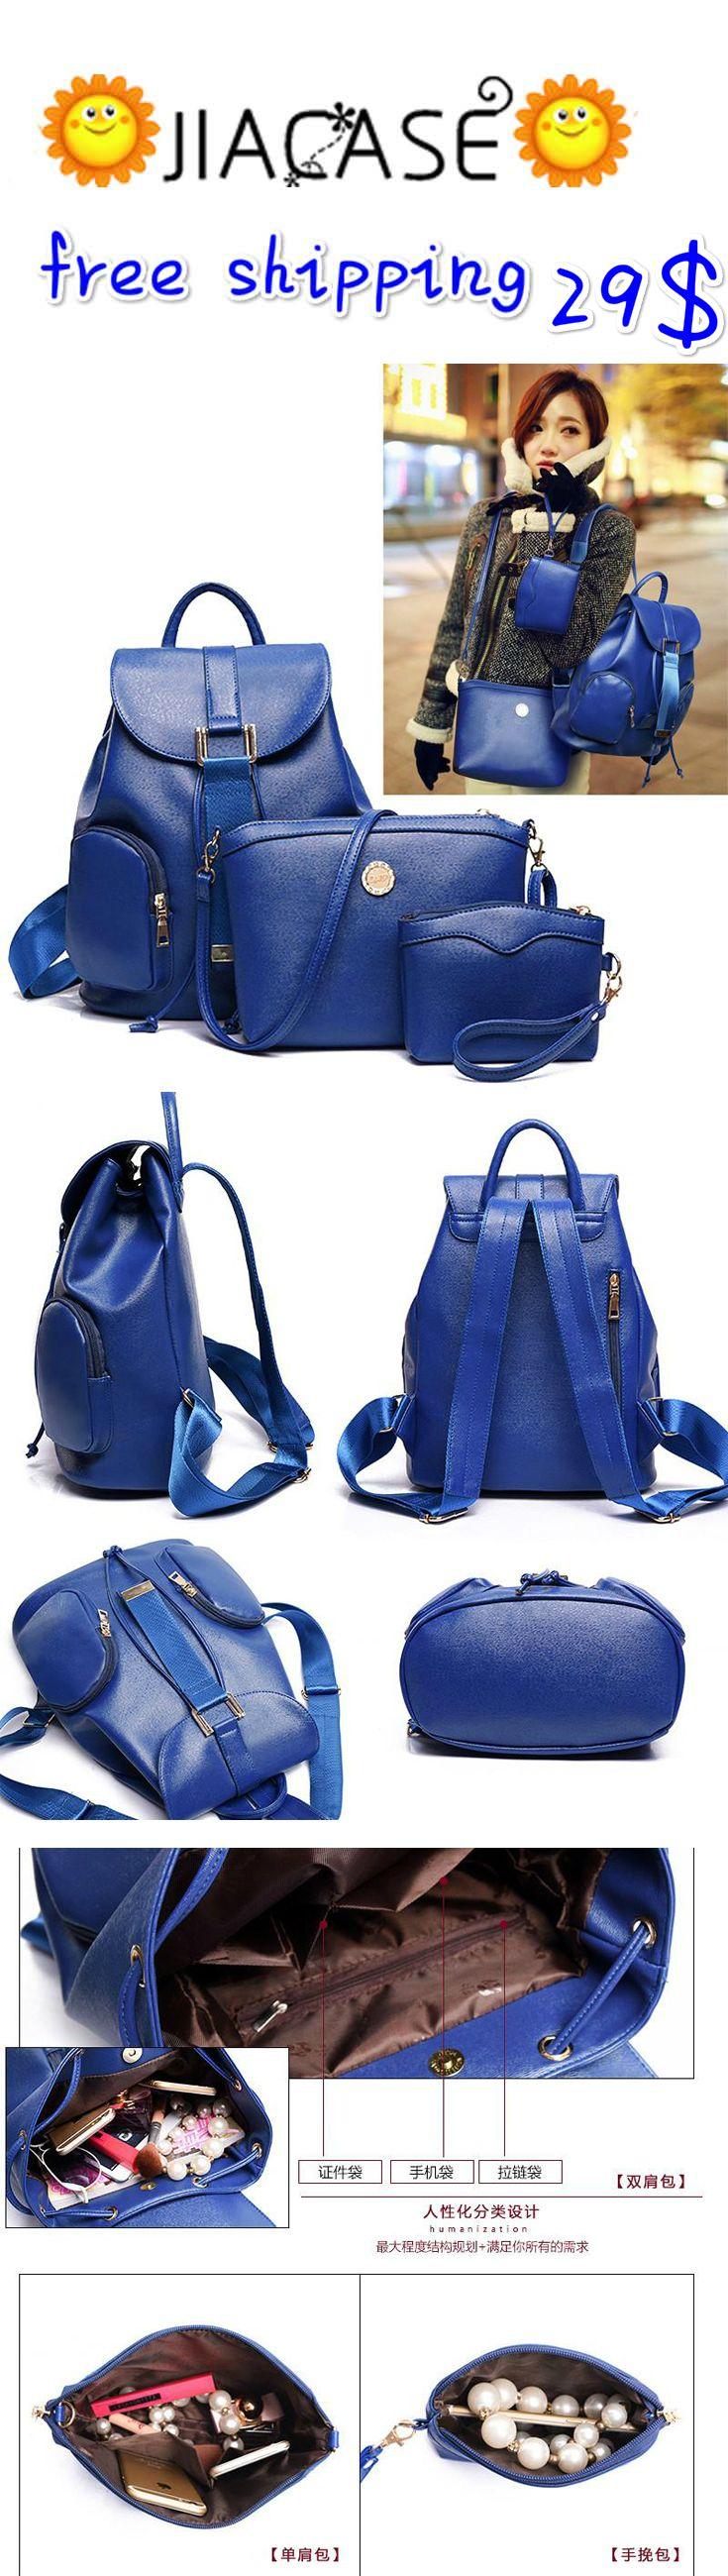 3 Pcs/Set Women #Shoulder #Bag #Handbags PU #Leather #Messenger Bag